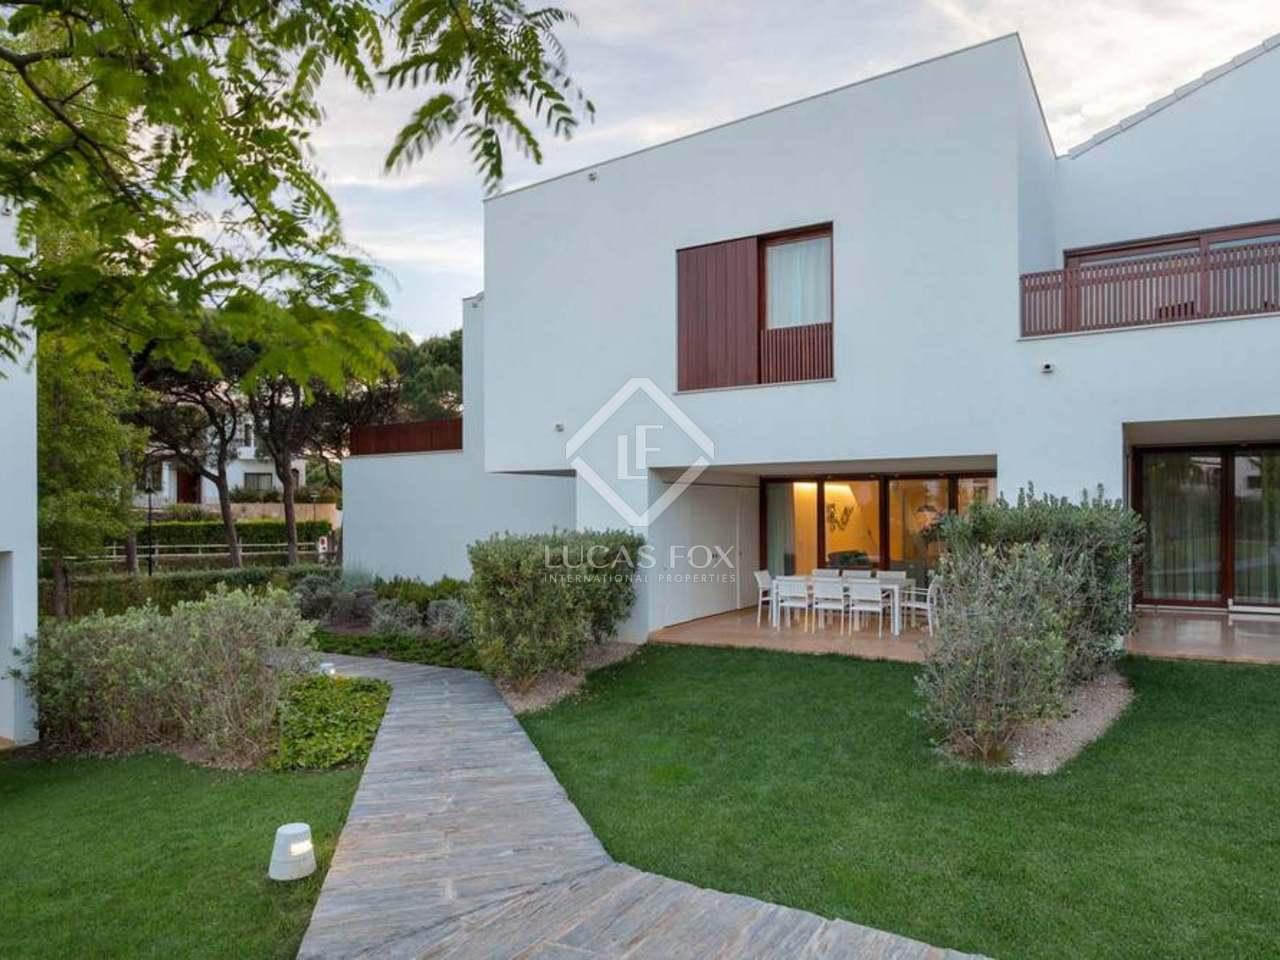 188m haus villa zum verkauf in algarve portugal. Black Bedroom Furniture Sets. Home Design Ideas